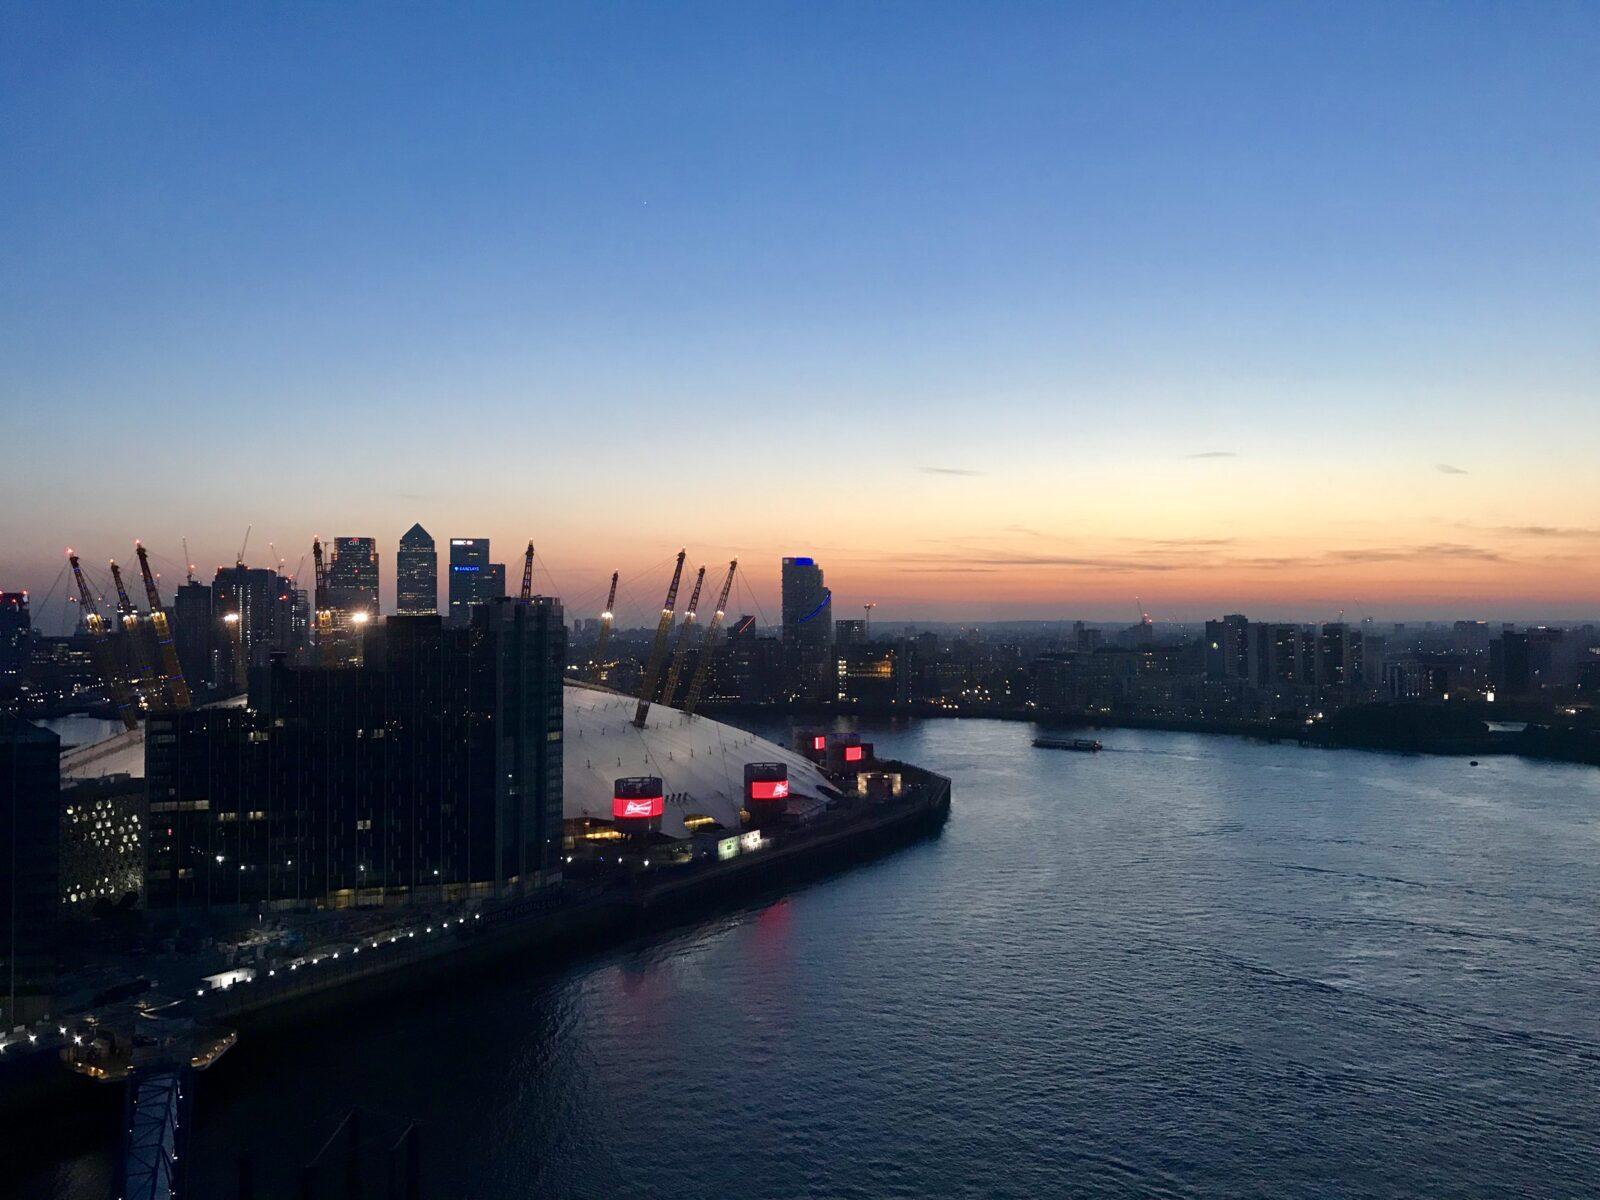 Emirates Air Line Cable Car london edit seven london city guide 2018